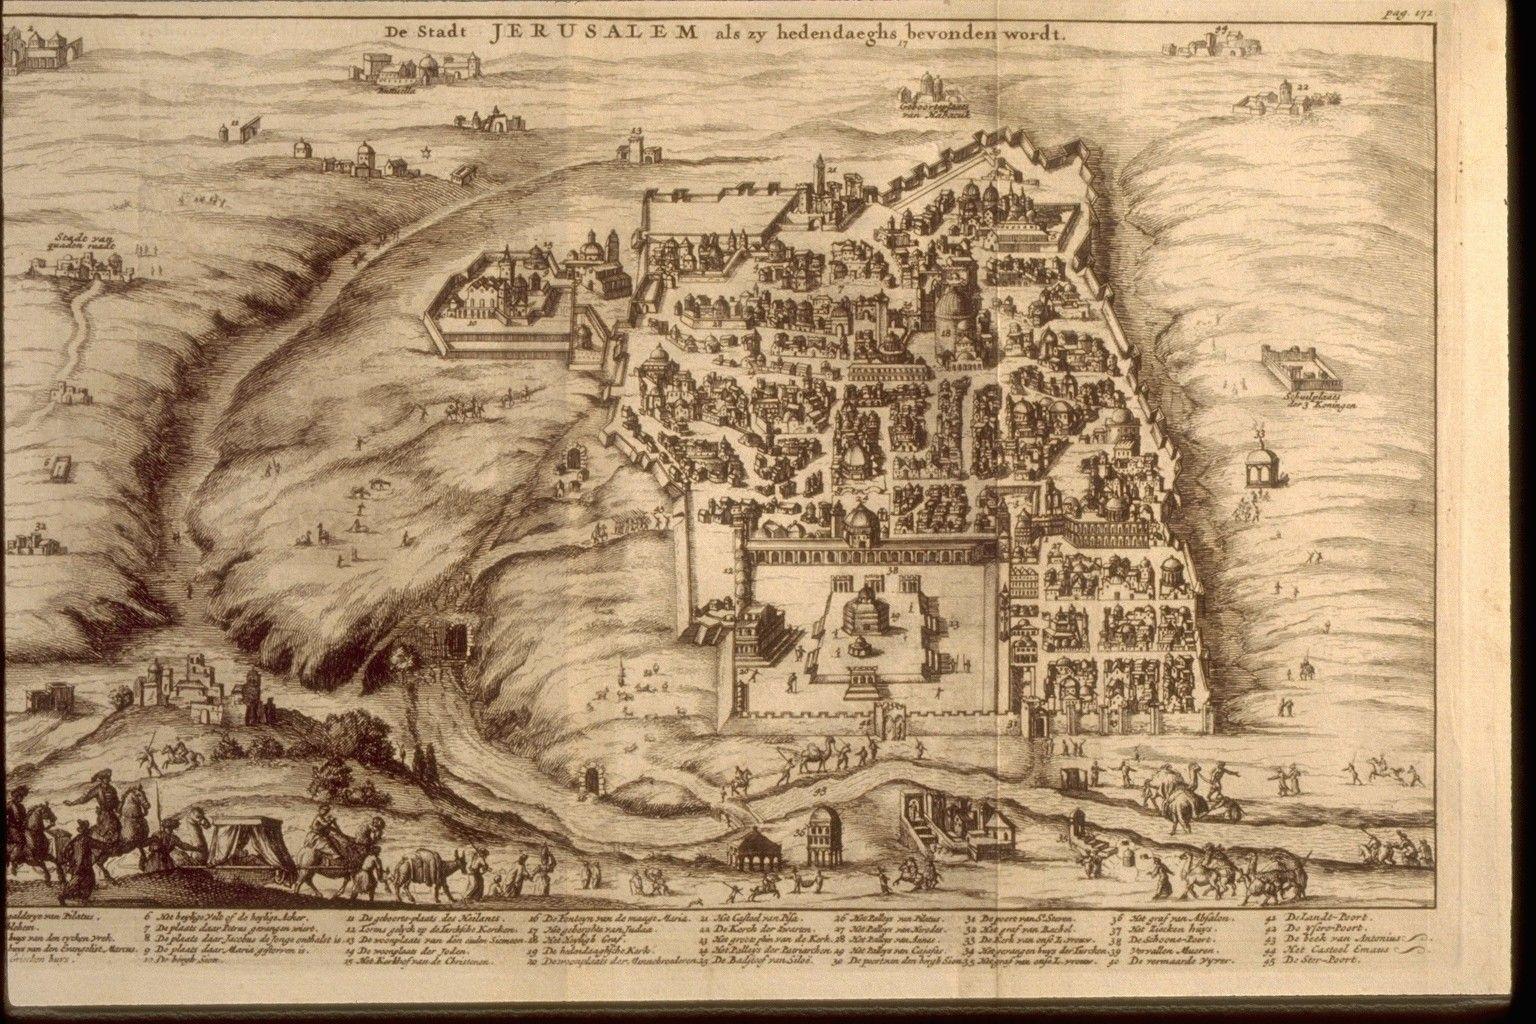 jFRANCISCUS HALMA Dutch, 1653-1722 De Stadt JERUSALEM als zy hedendaeghs bevonden wordt